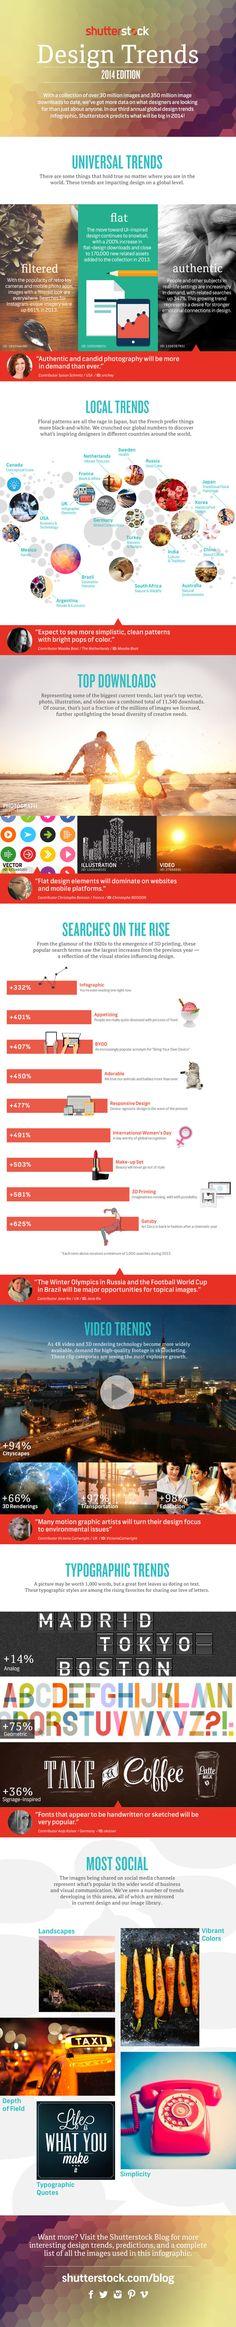 Global Design Trends for 2014